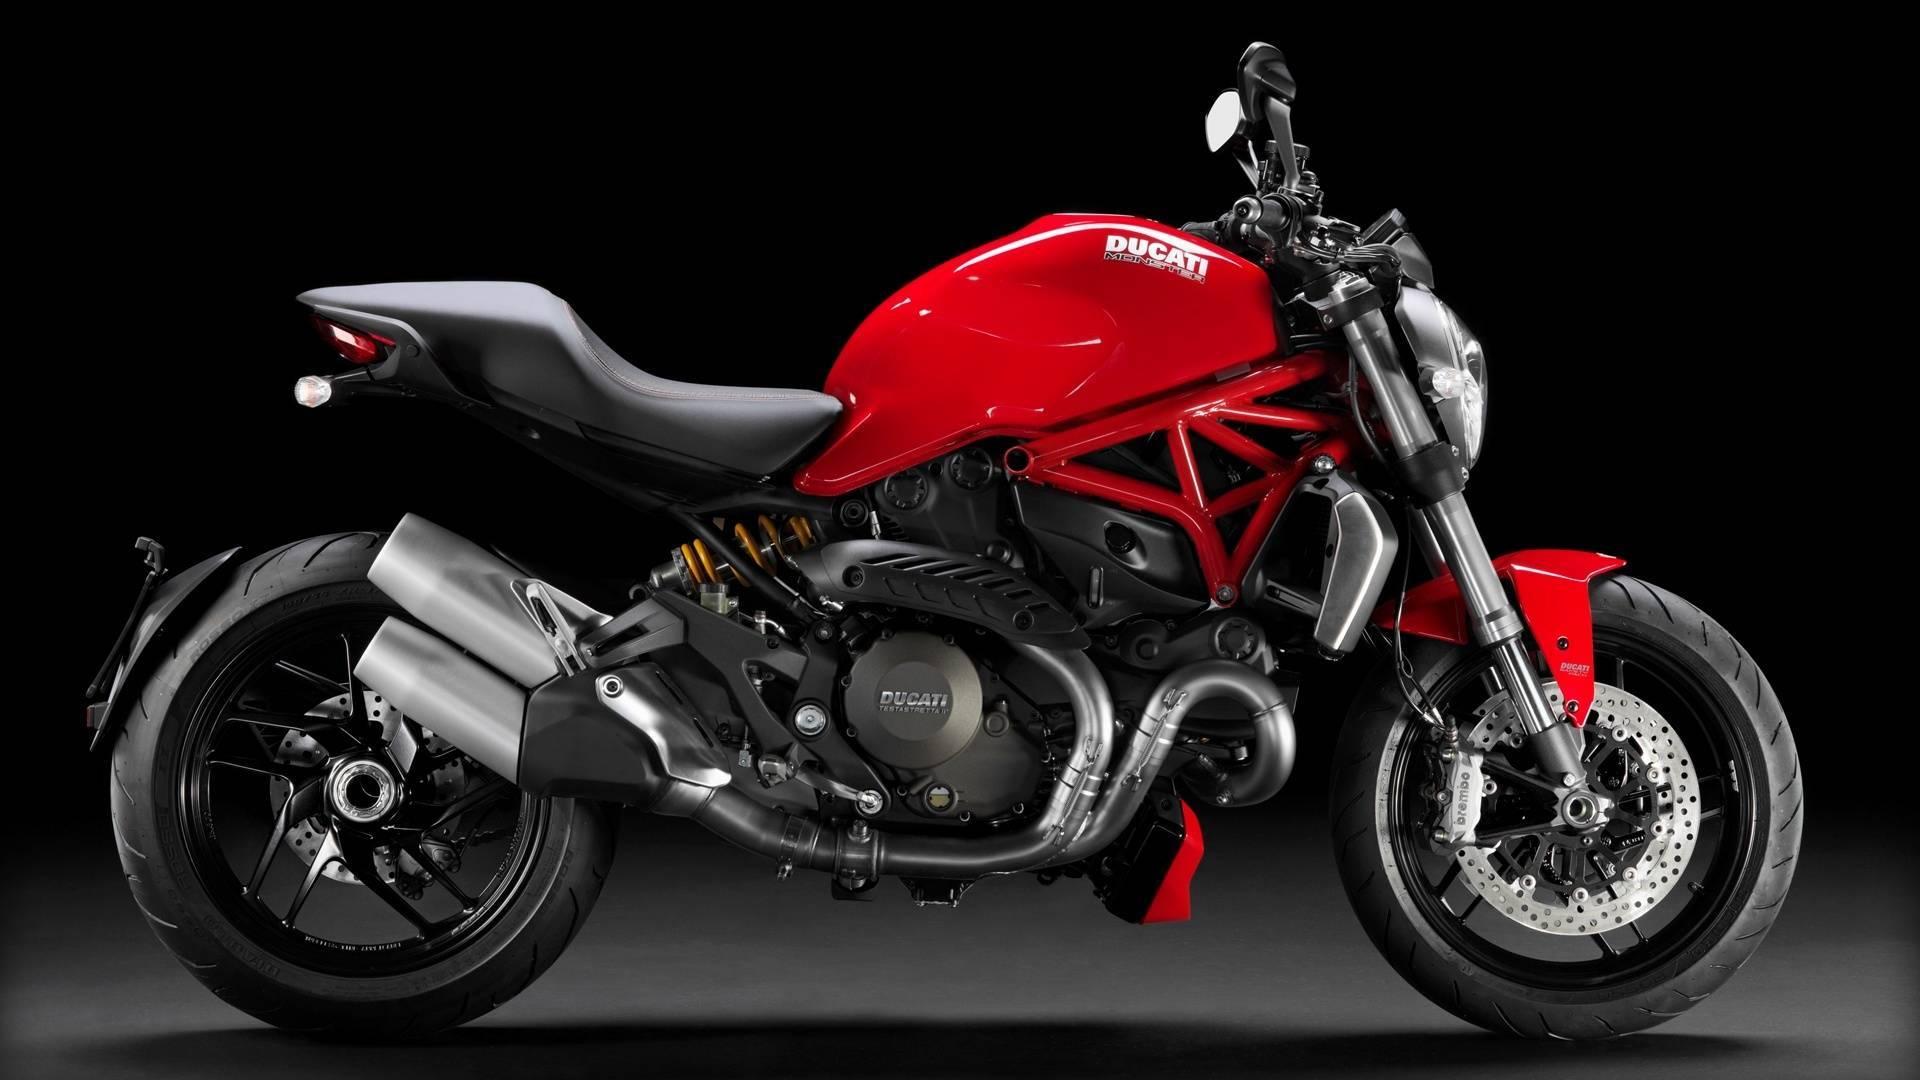 ducati monster 1200 price mileage review ducati bikes. Black Bedroom Furniture Sets. Home Design Ideas